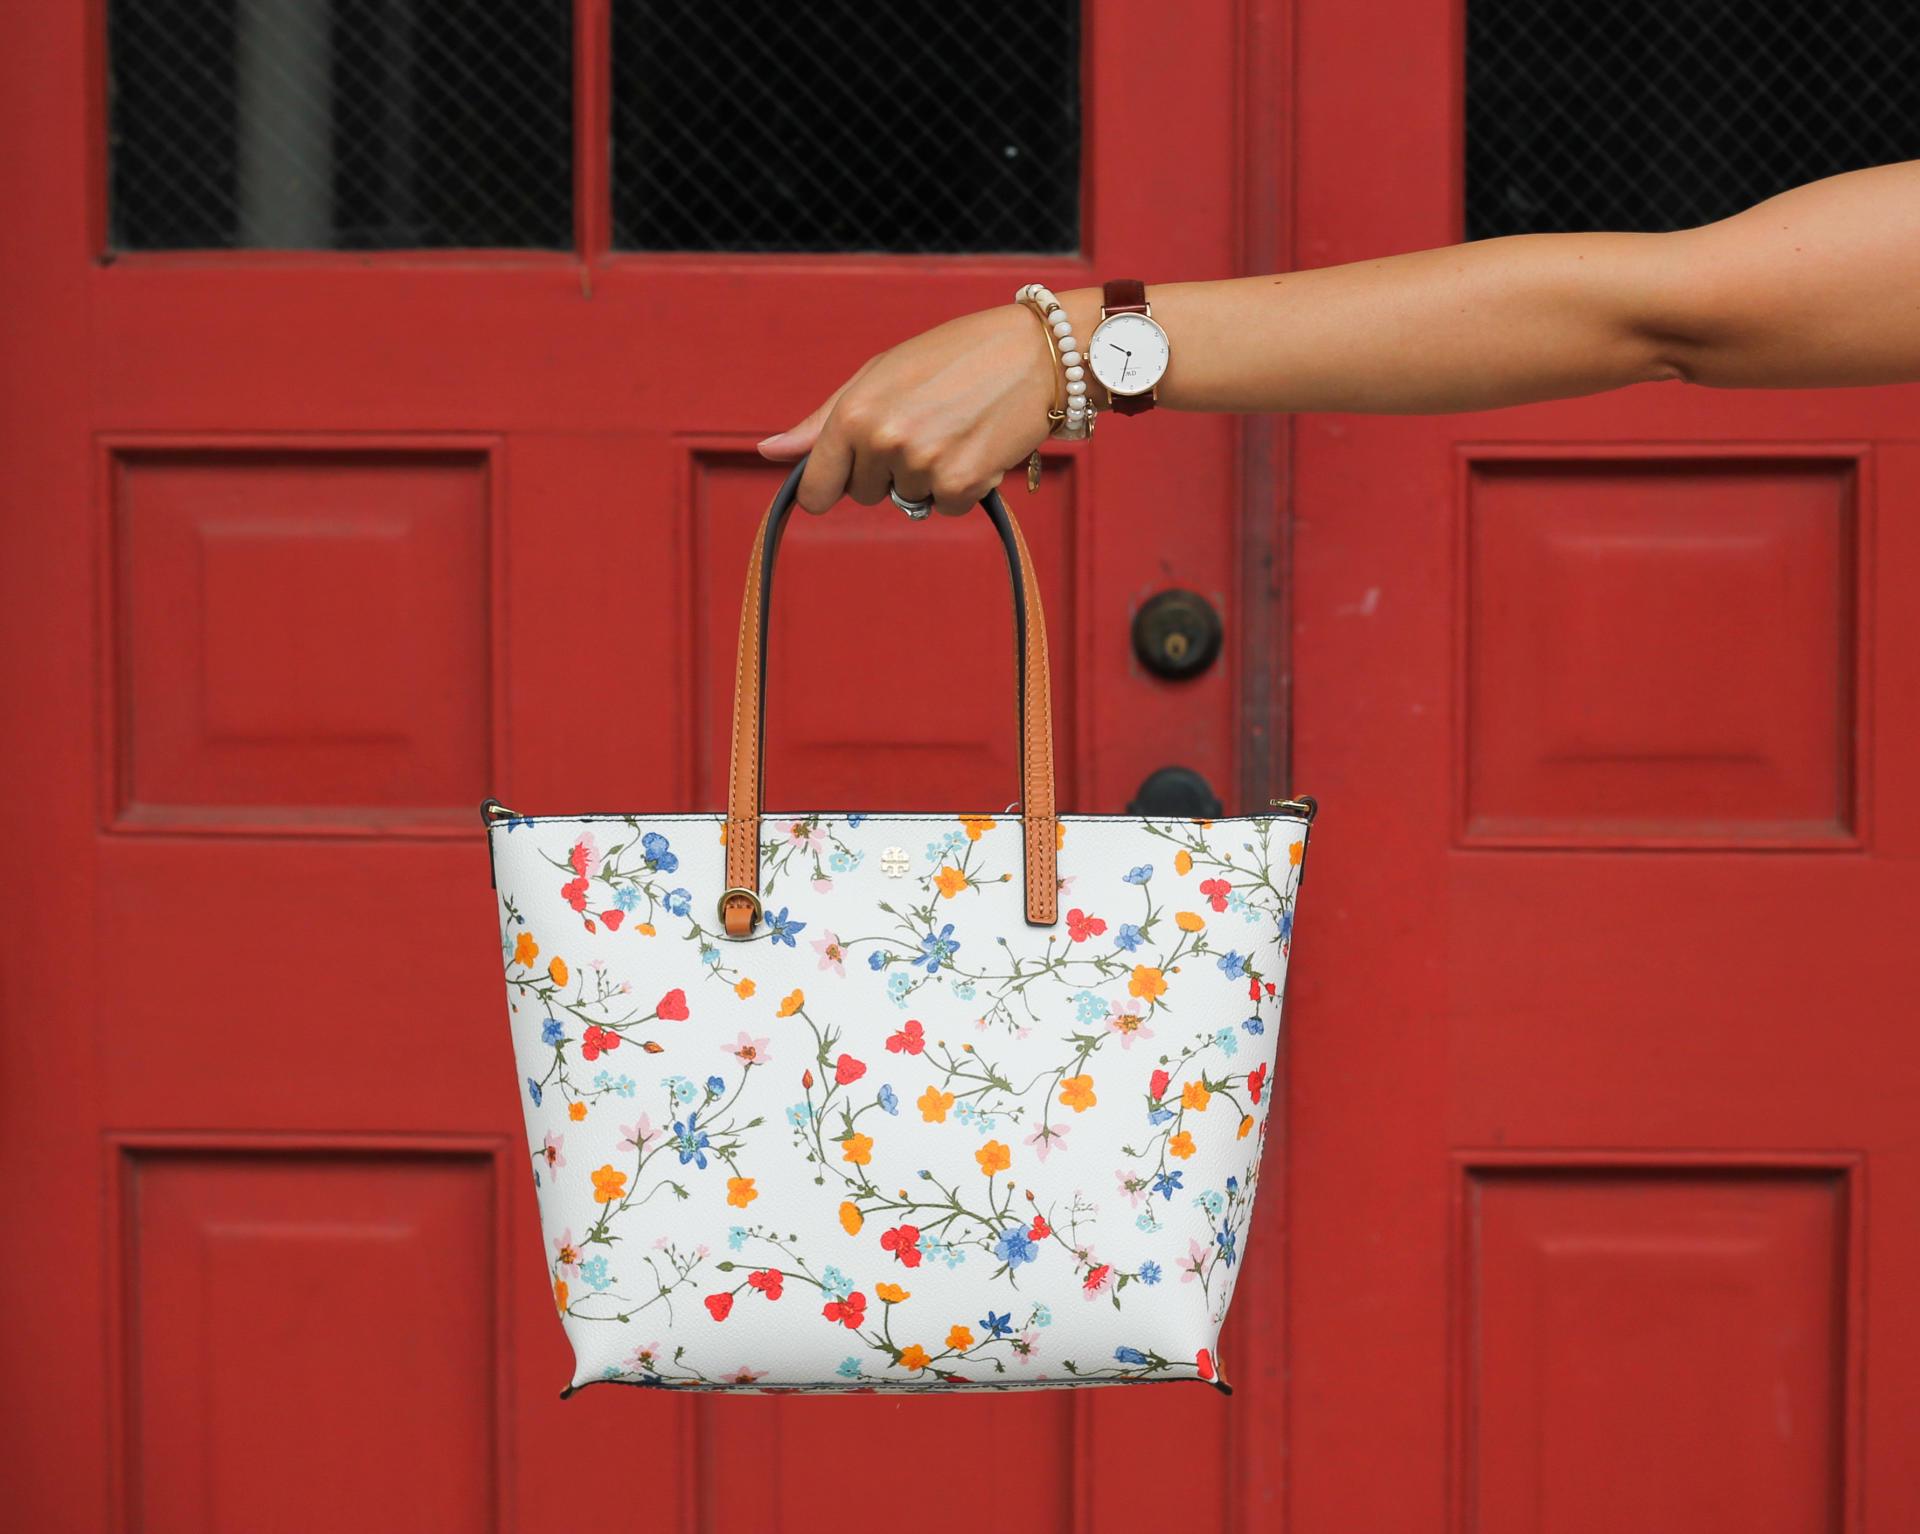 Tory Burch Floral Bag